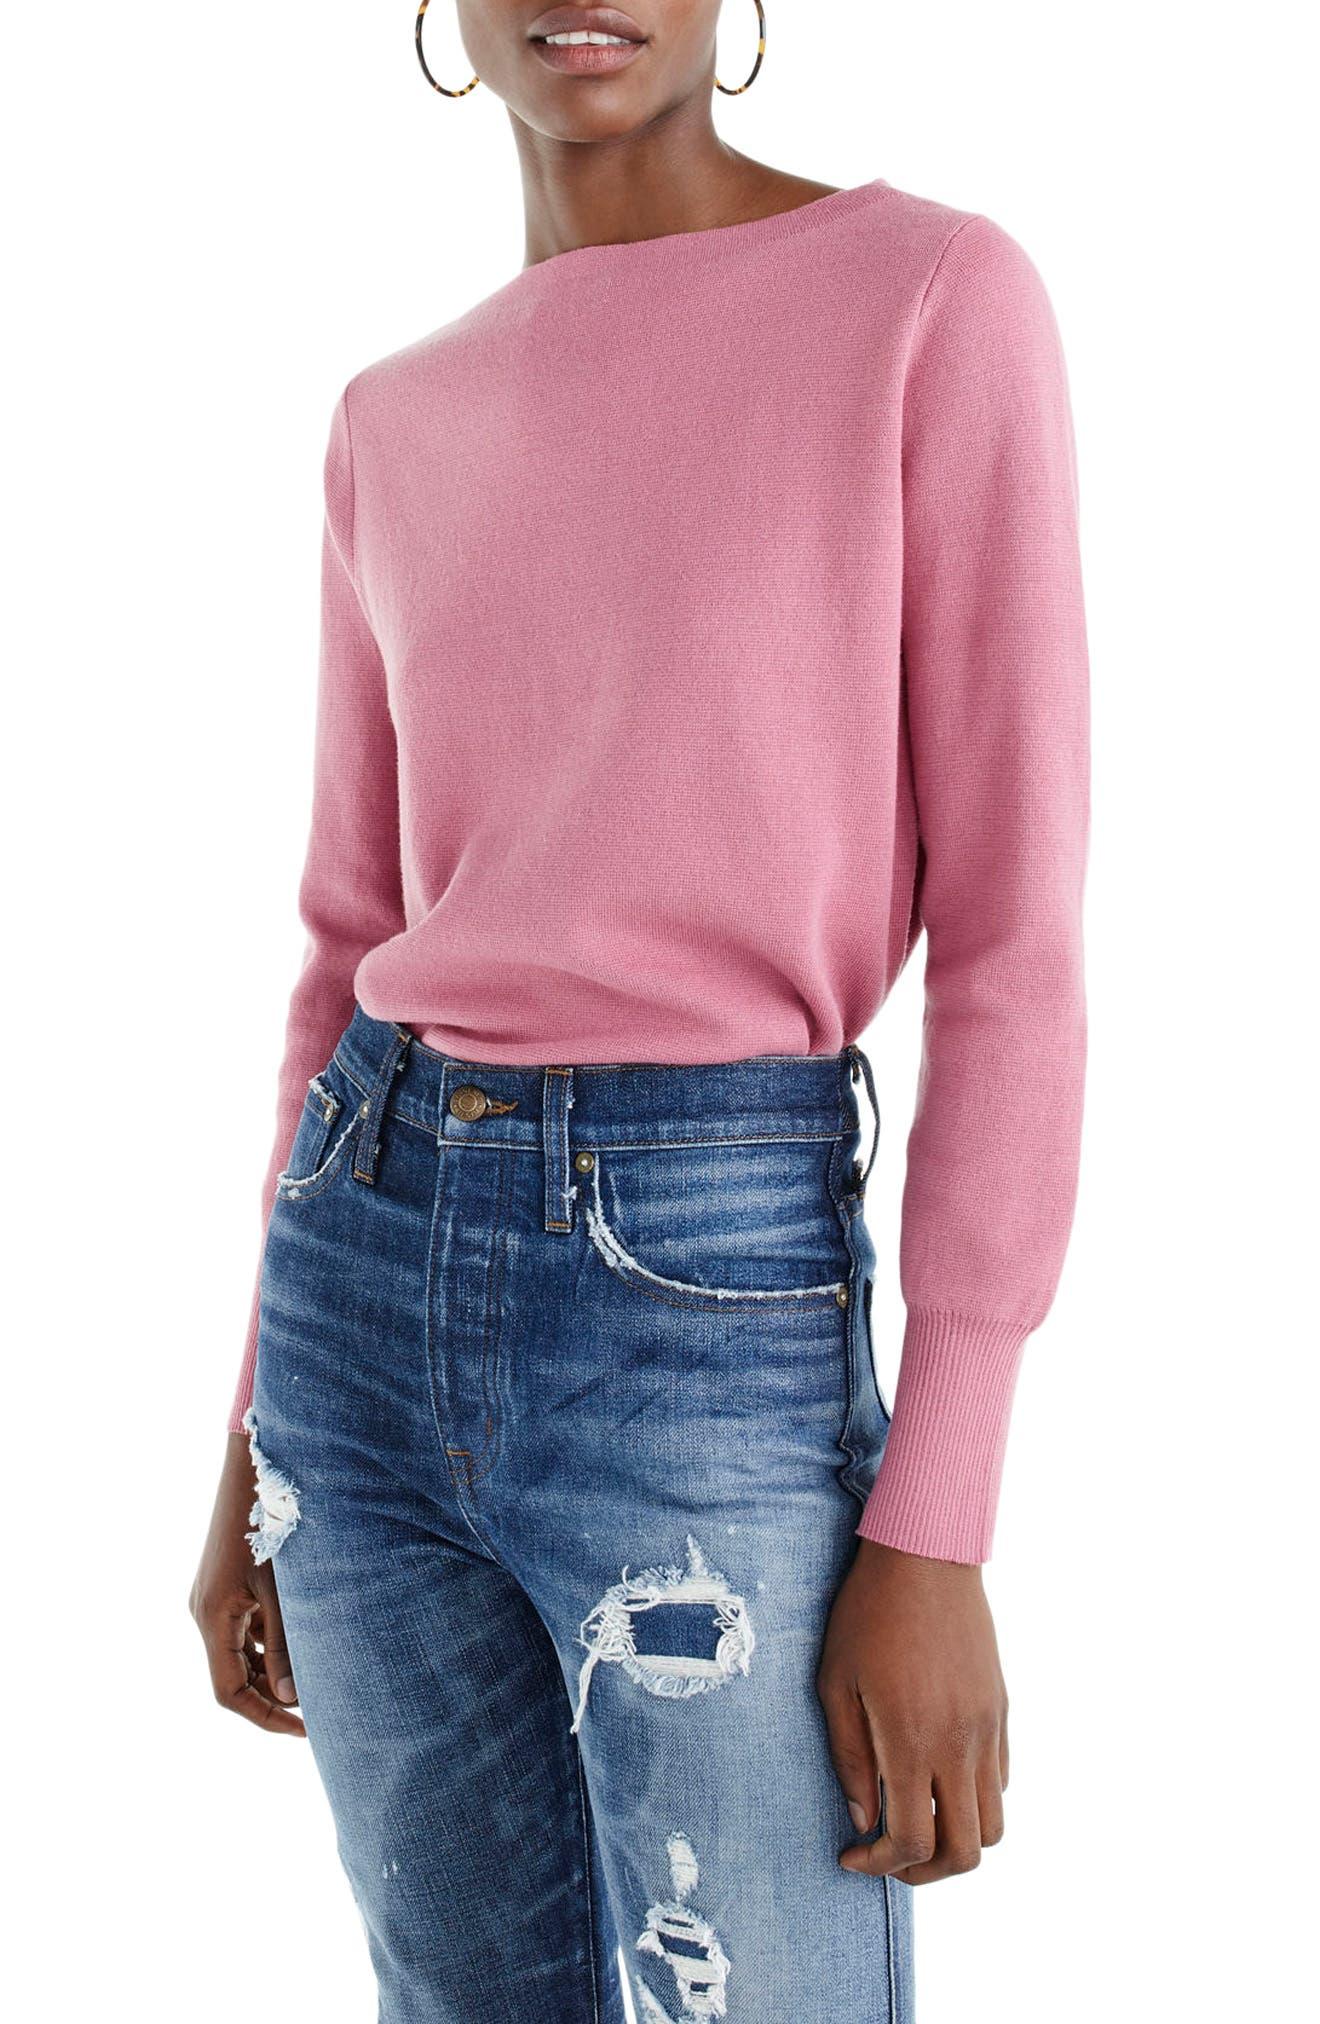 J.Crew Merino Wool Blend Boatneck Sweater